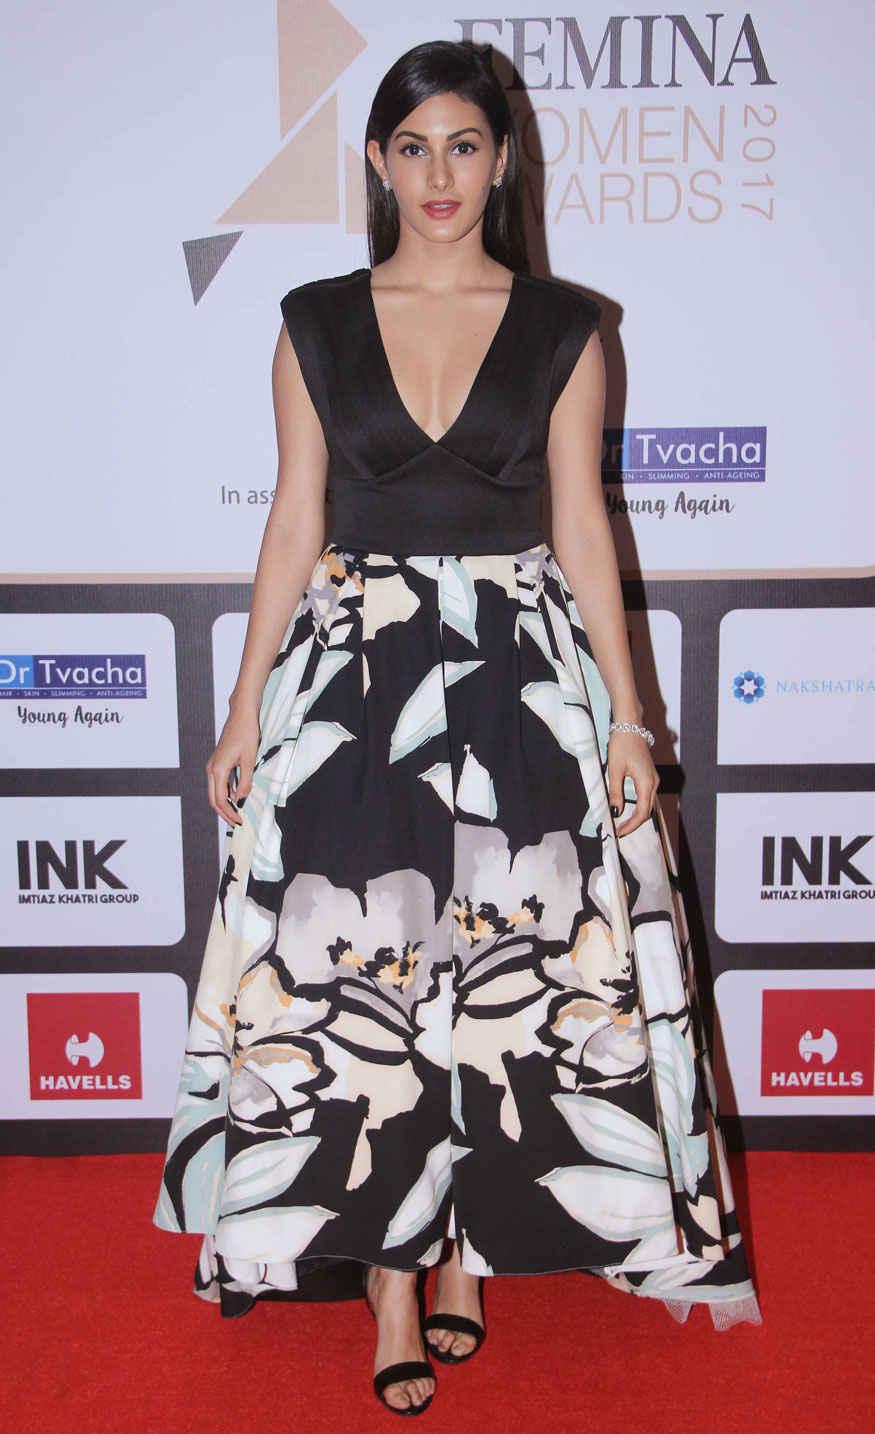 Amyra Dastur Attend Femina Women Awards 2017 Event Stills